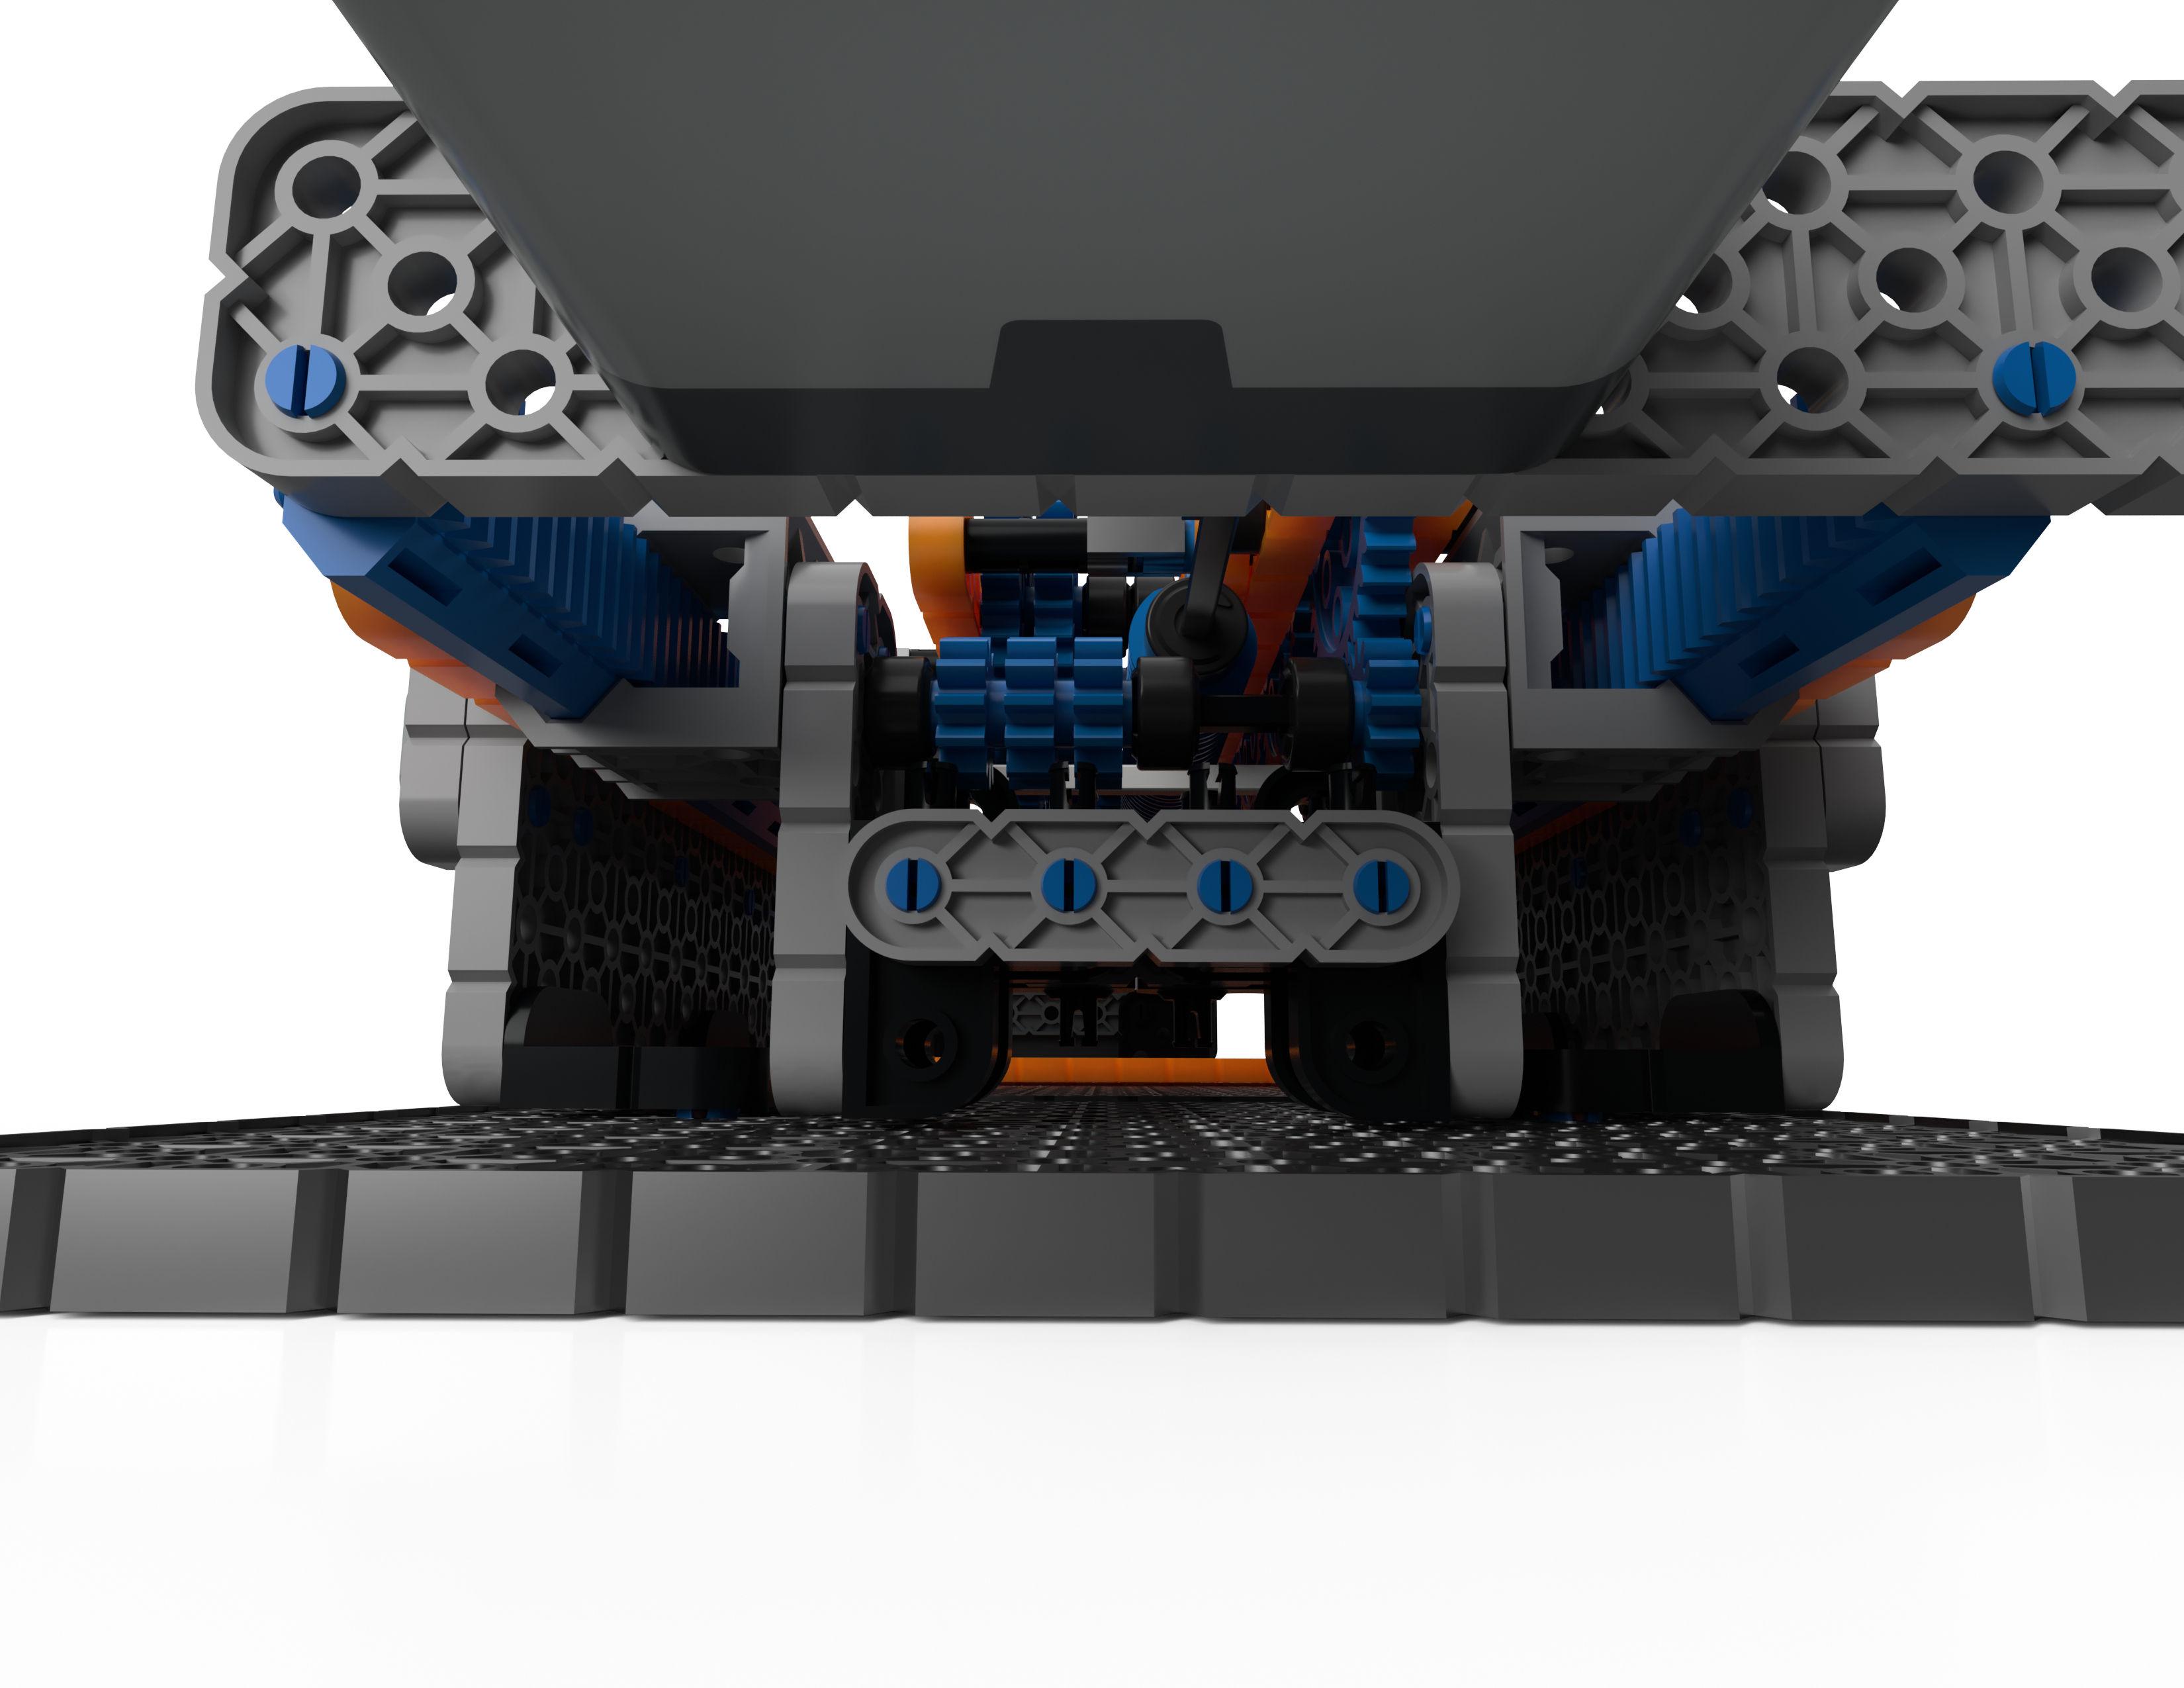 Dynamics---vex-iq-robotics-2018-feb-15-03-33-23pm-000-customizedview9884723094-jpeg-3500-3500